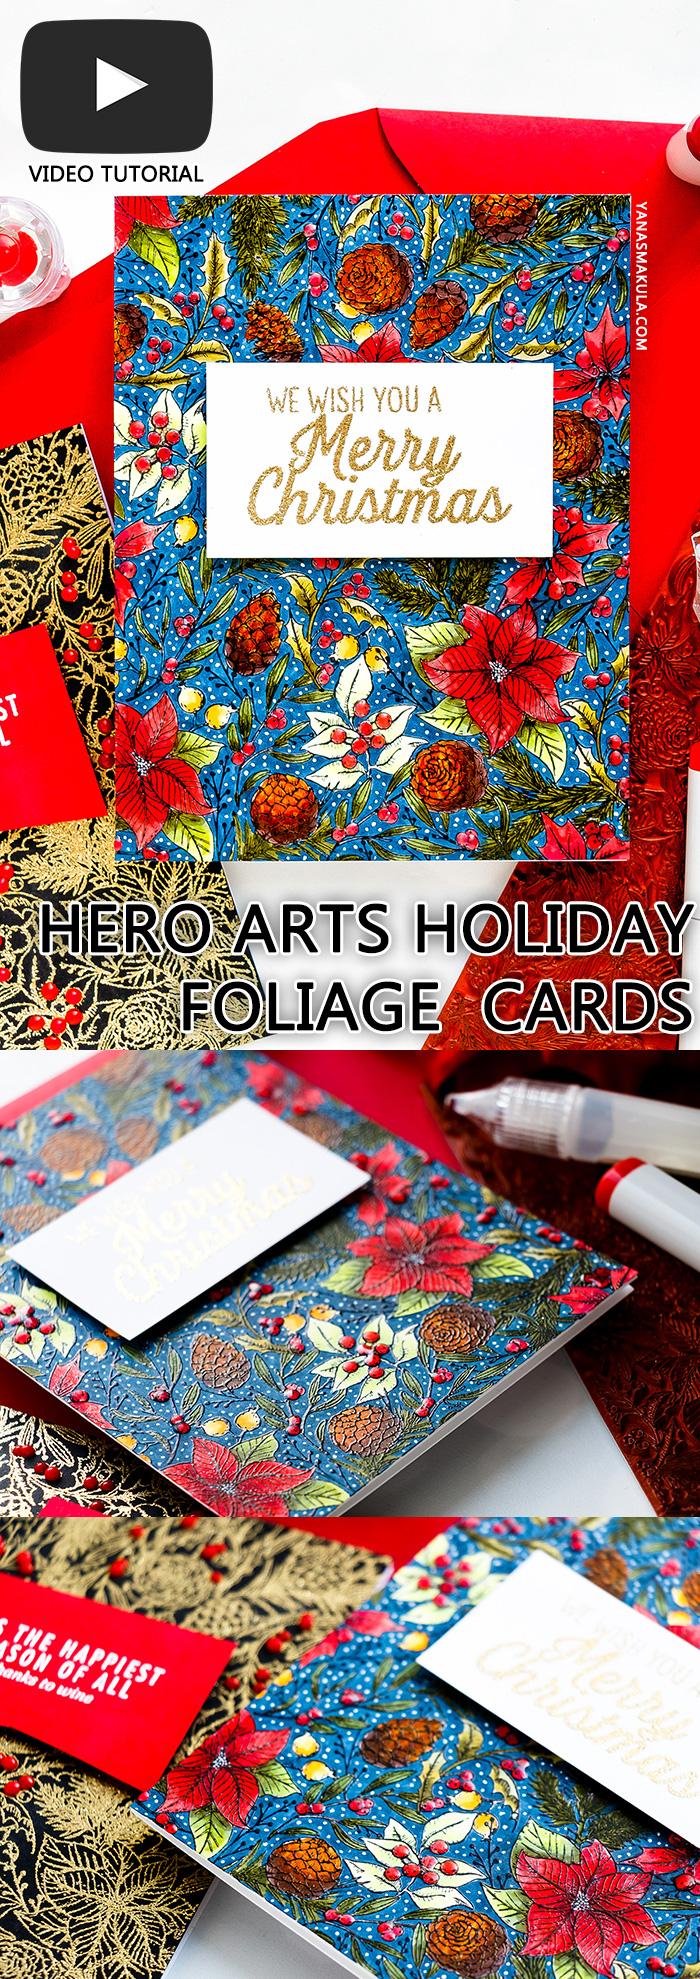 Hero Arts | One Background Three Ways - Holiday Foliage Cards by Yana Smakula #stamping #heroarts #christmascard #cardmakingforbeginners #cardmaking #yscardmaking #stampingtechniques #christmascardhandmade